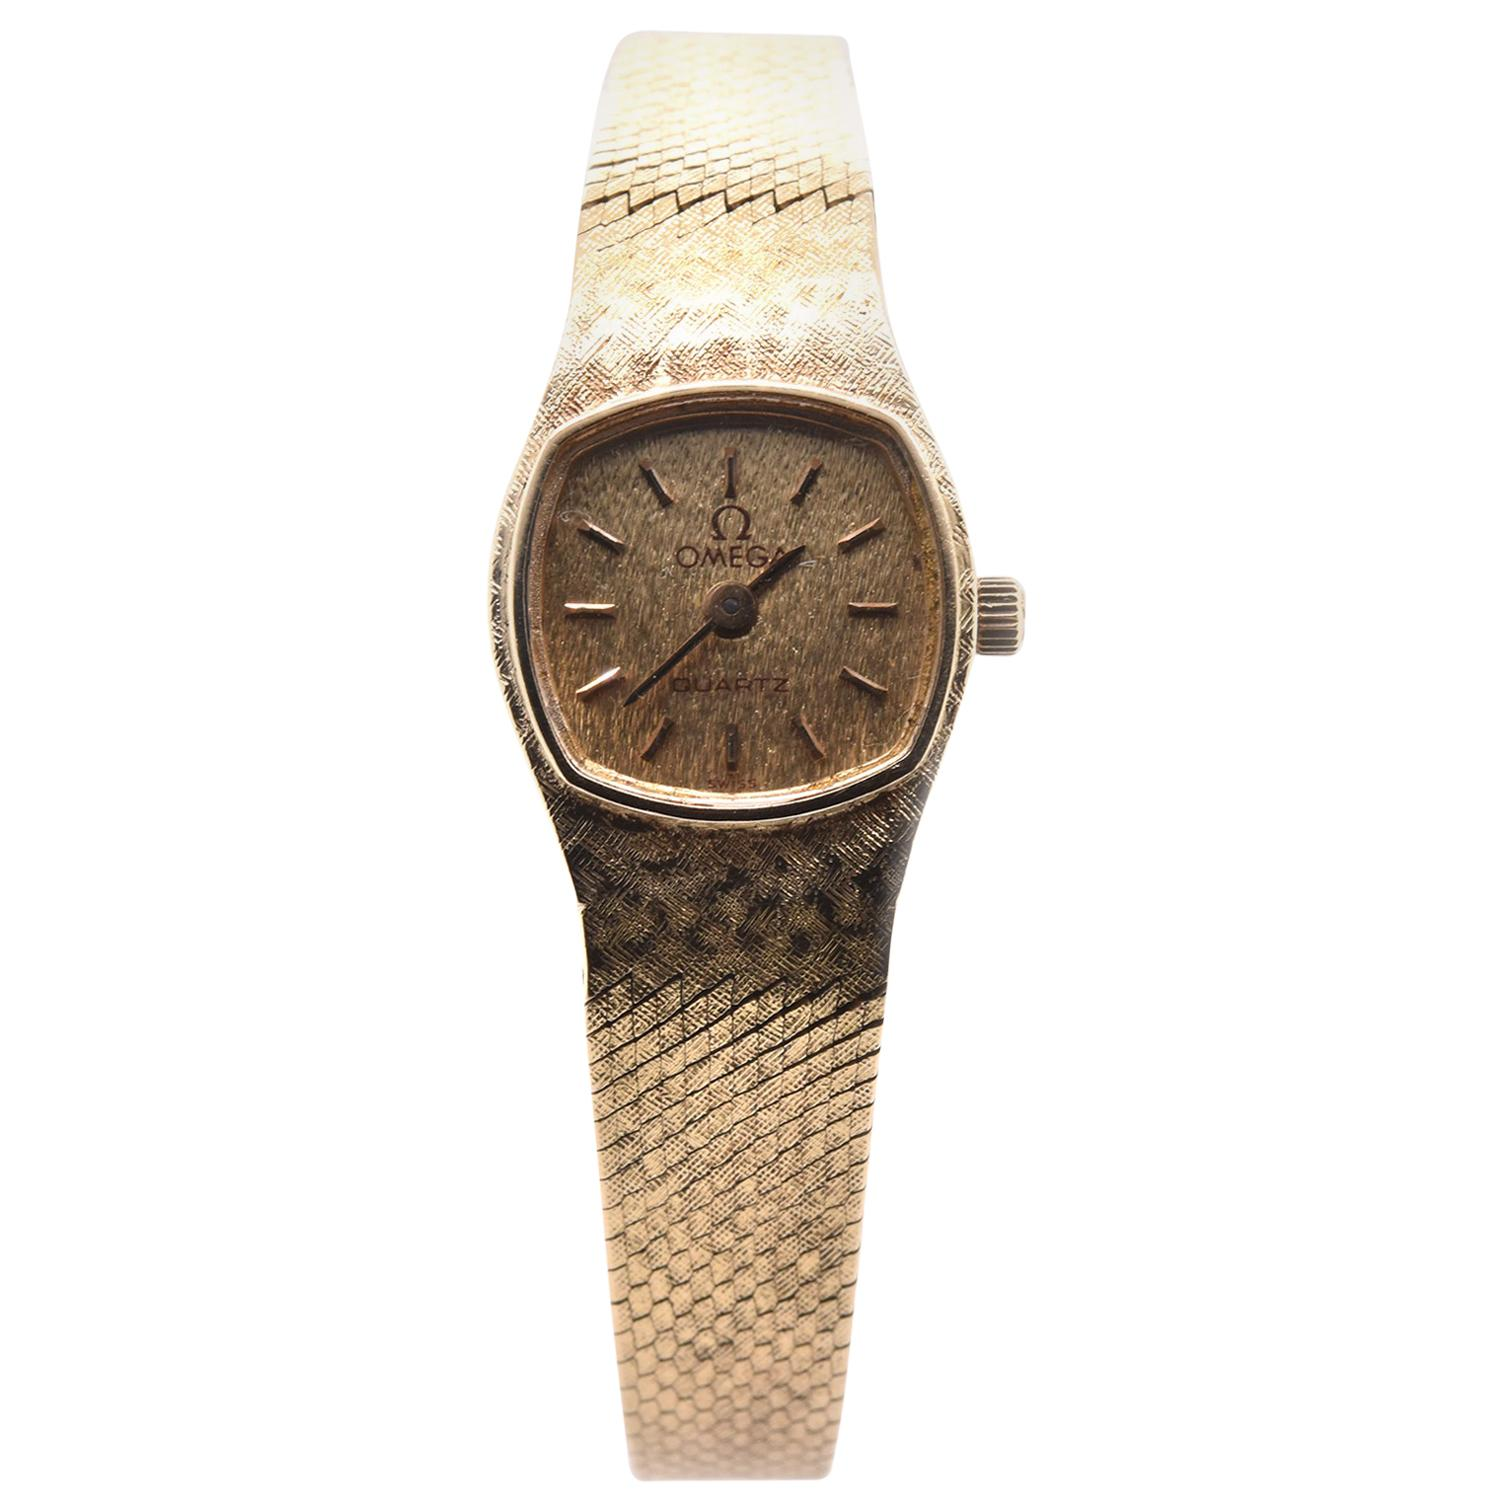 14 Karat Yellow Gold Vintage Omega Quartz Watch